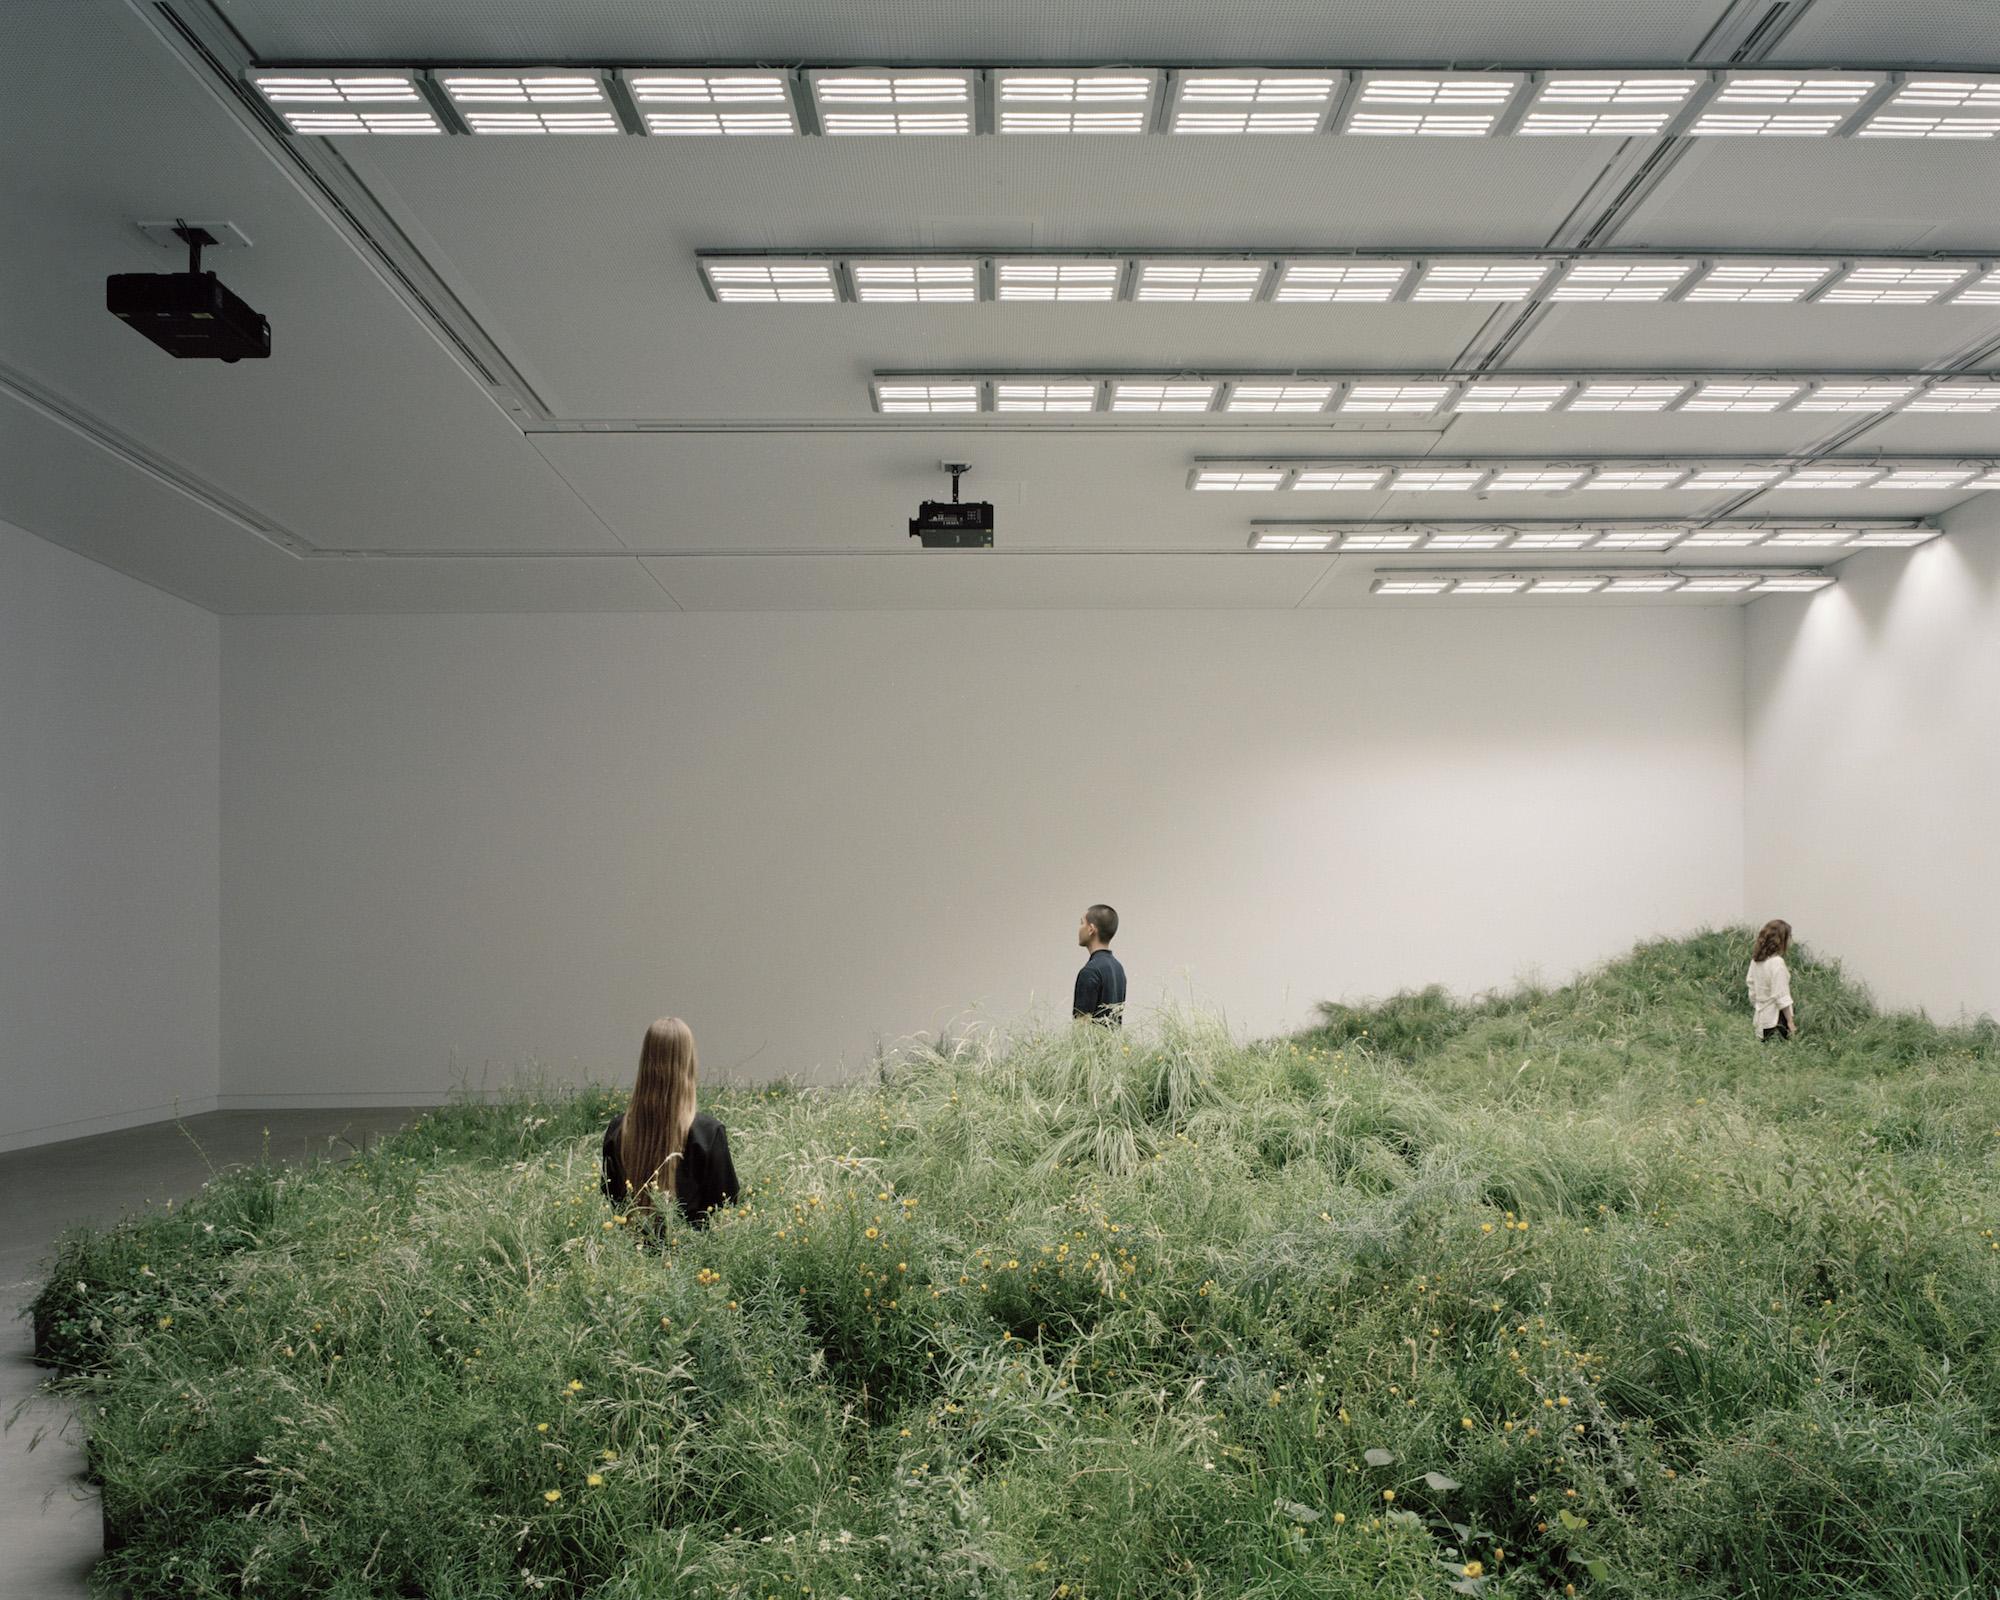 Indoor Installation of 10,000 Plants Considers Relationship Between Endangered Australian Grasslands and Architecture